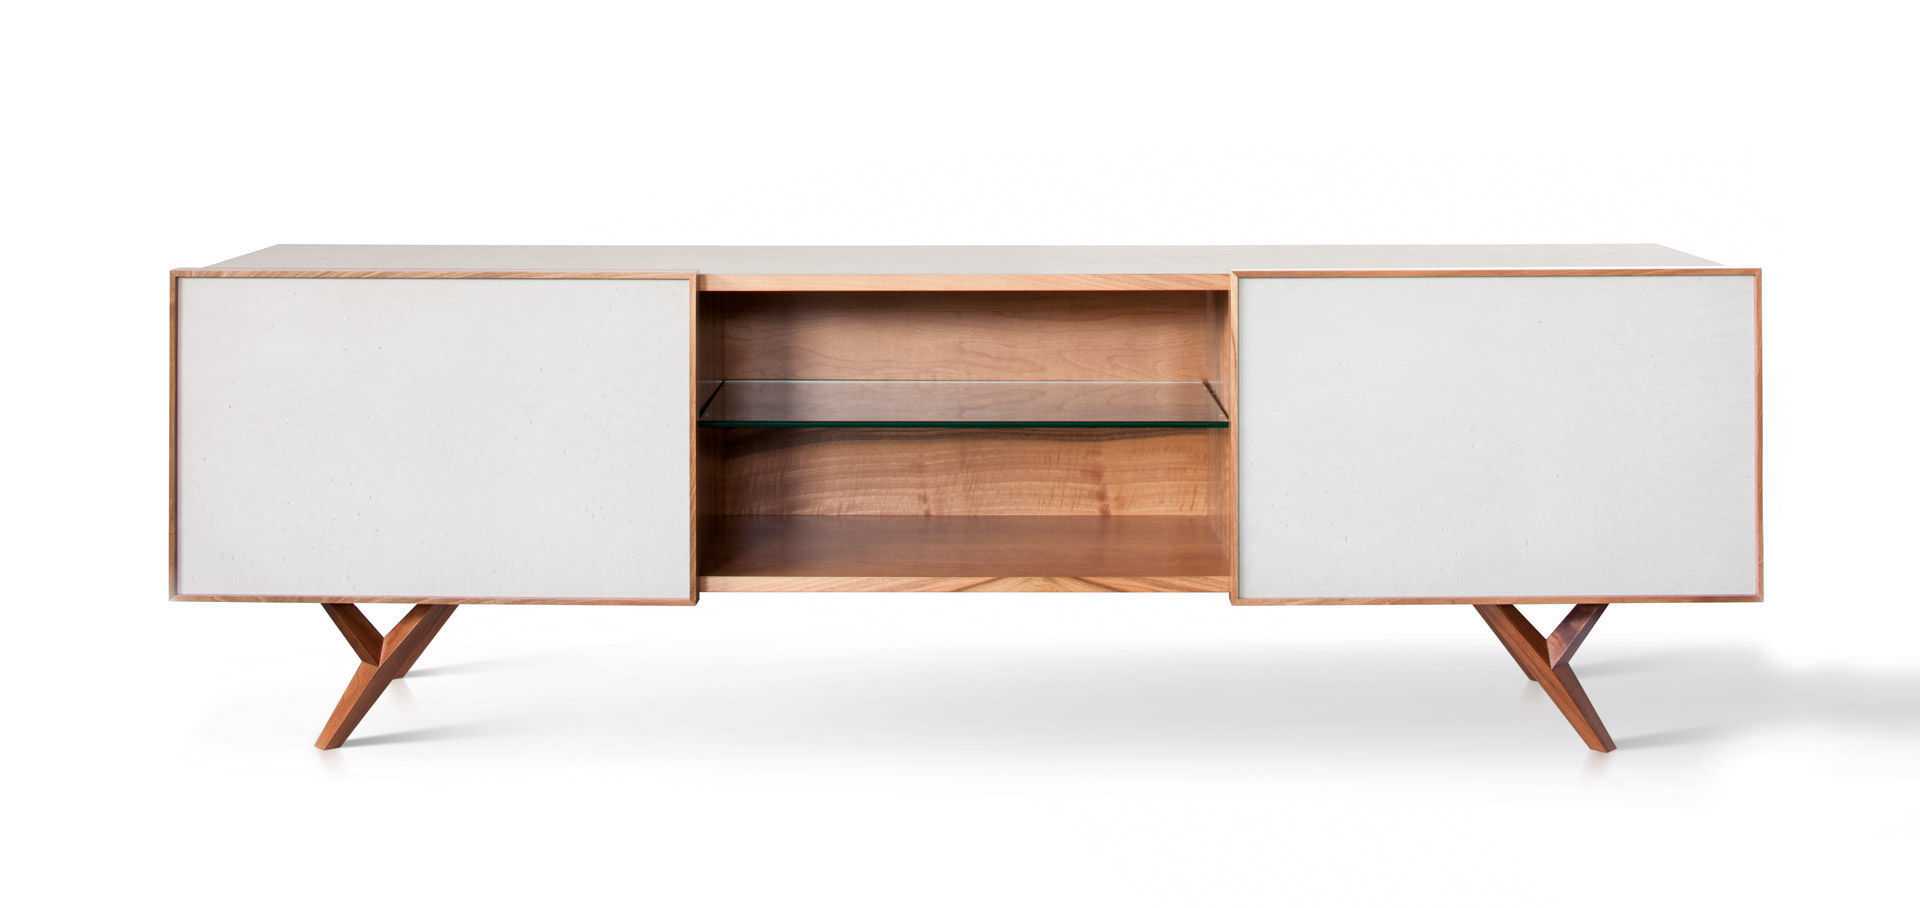 Modernes Sideboard Beton Weiss Gio 240 Sai Industry